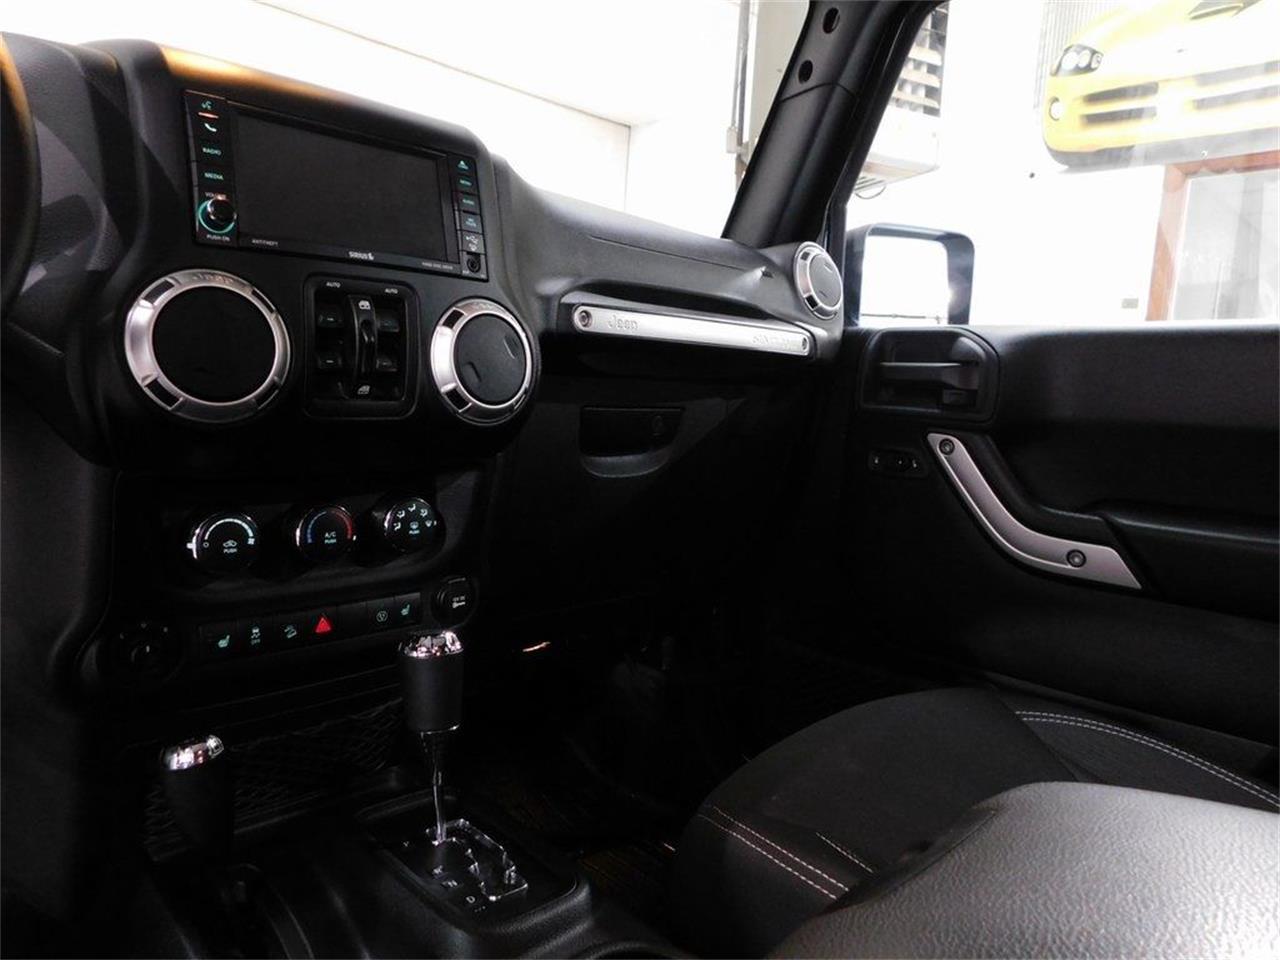 2017 Jeep Wrangler (CC-1412080) for sale in Hamburg, New York